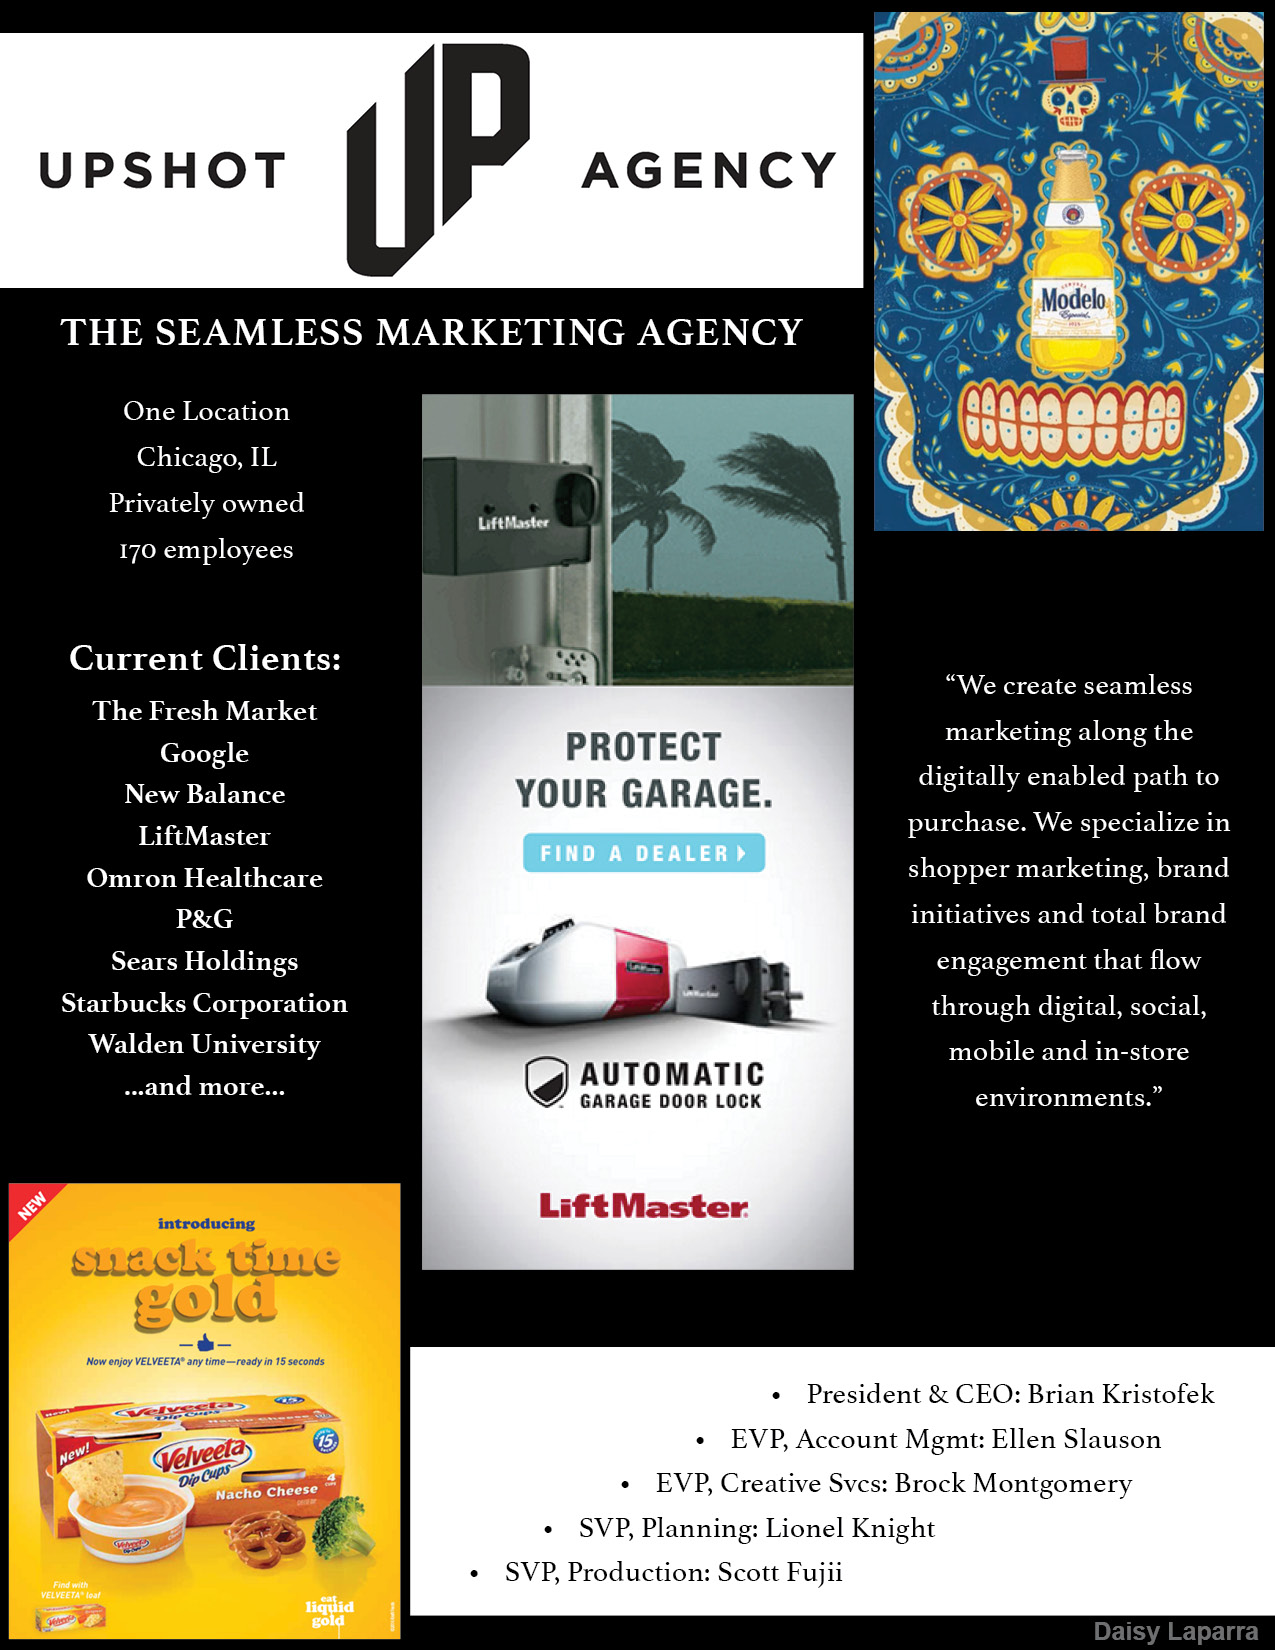 Upshot Agency Profile